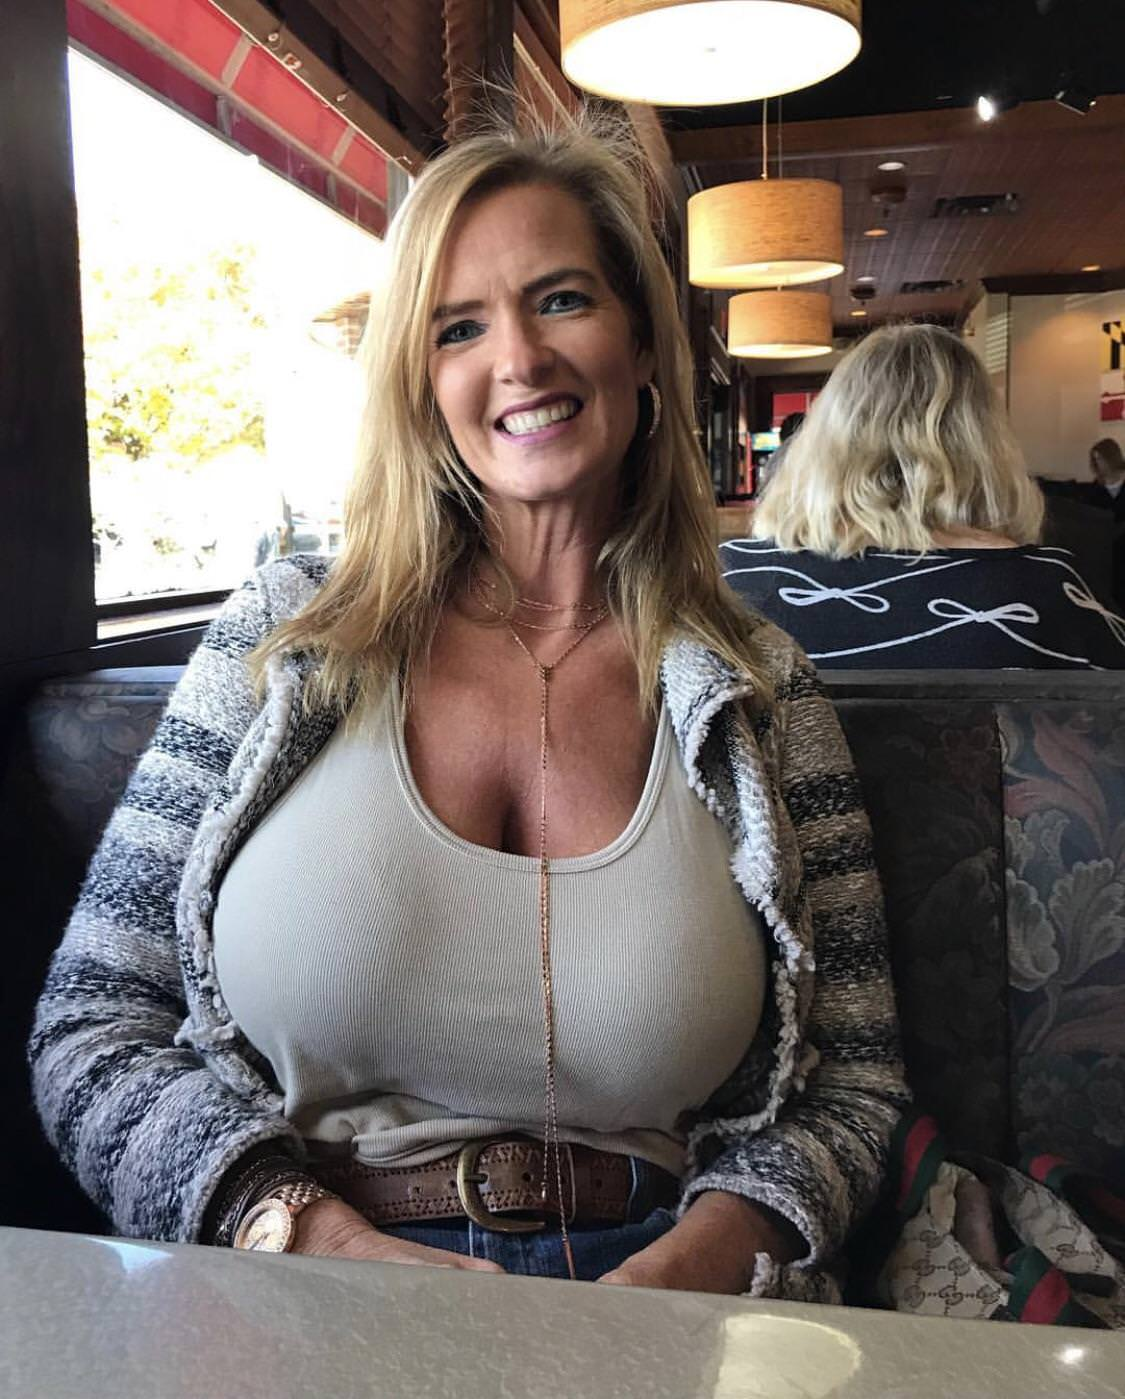 Big tit blonde cougar mature blonde milf brooke tyler with big tits